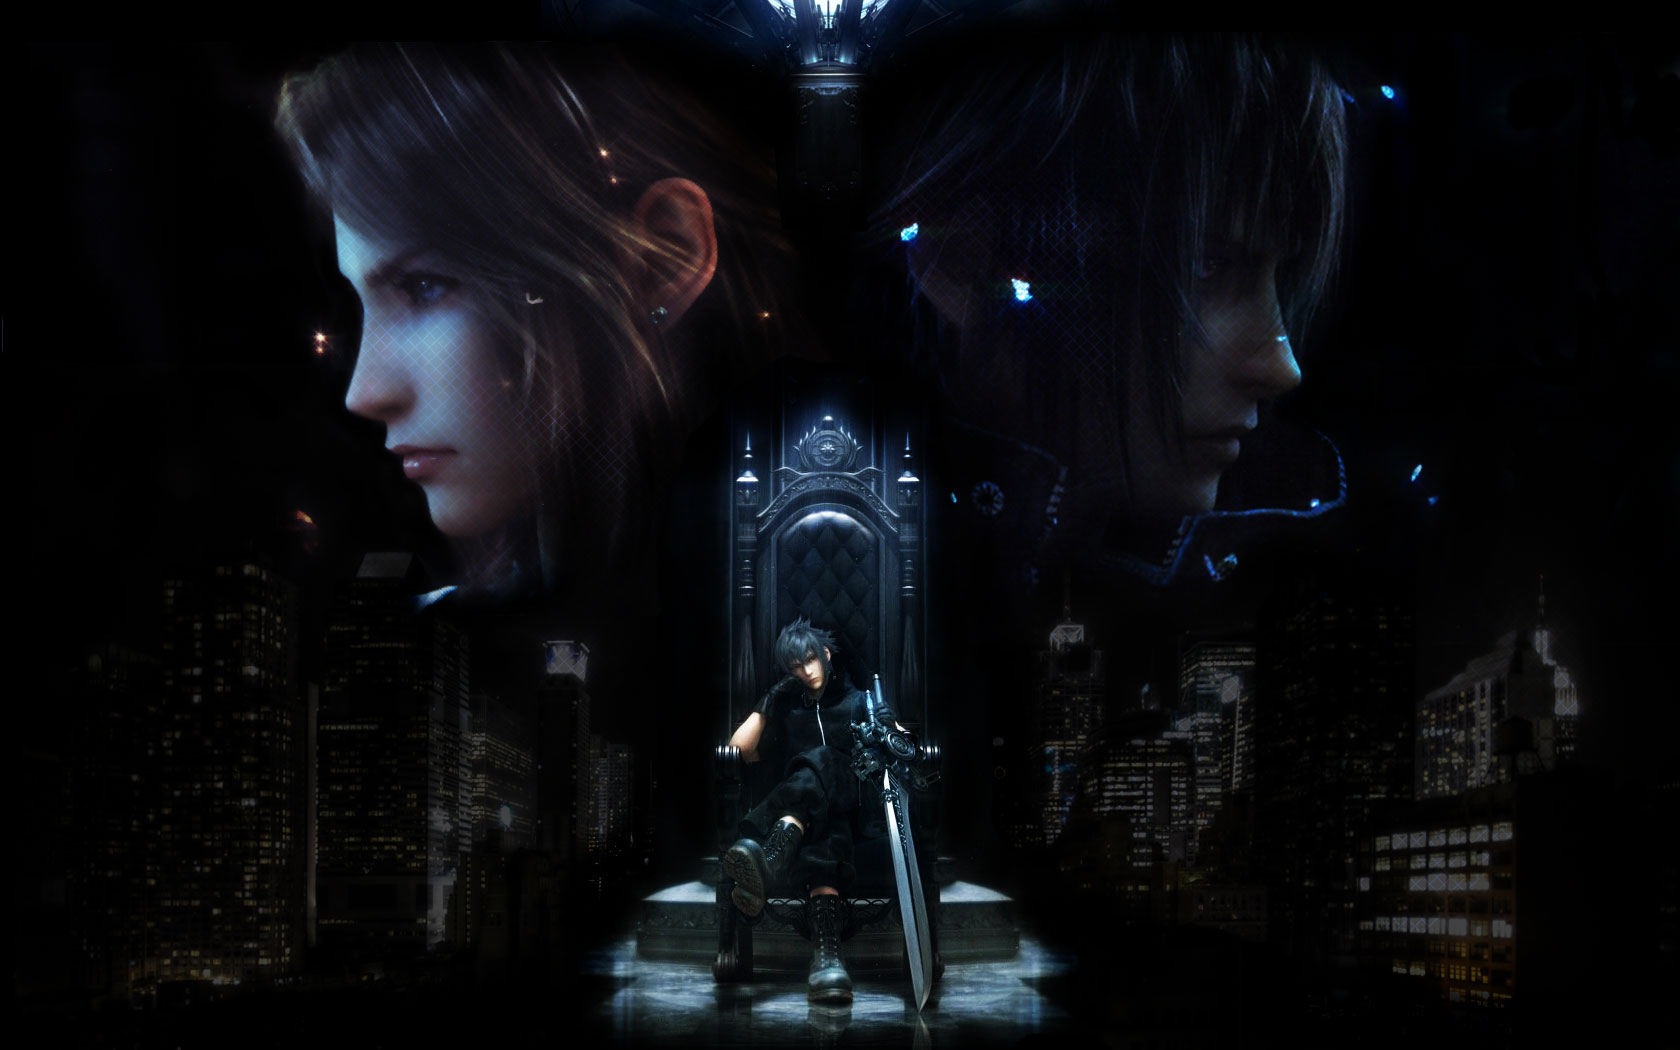 4k Noctis Lucis Caelum Final Fantasy Xv Hd Games 4k: Final Fantasy XIII Wallpaper: Versus